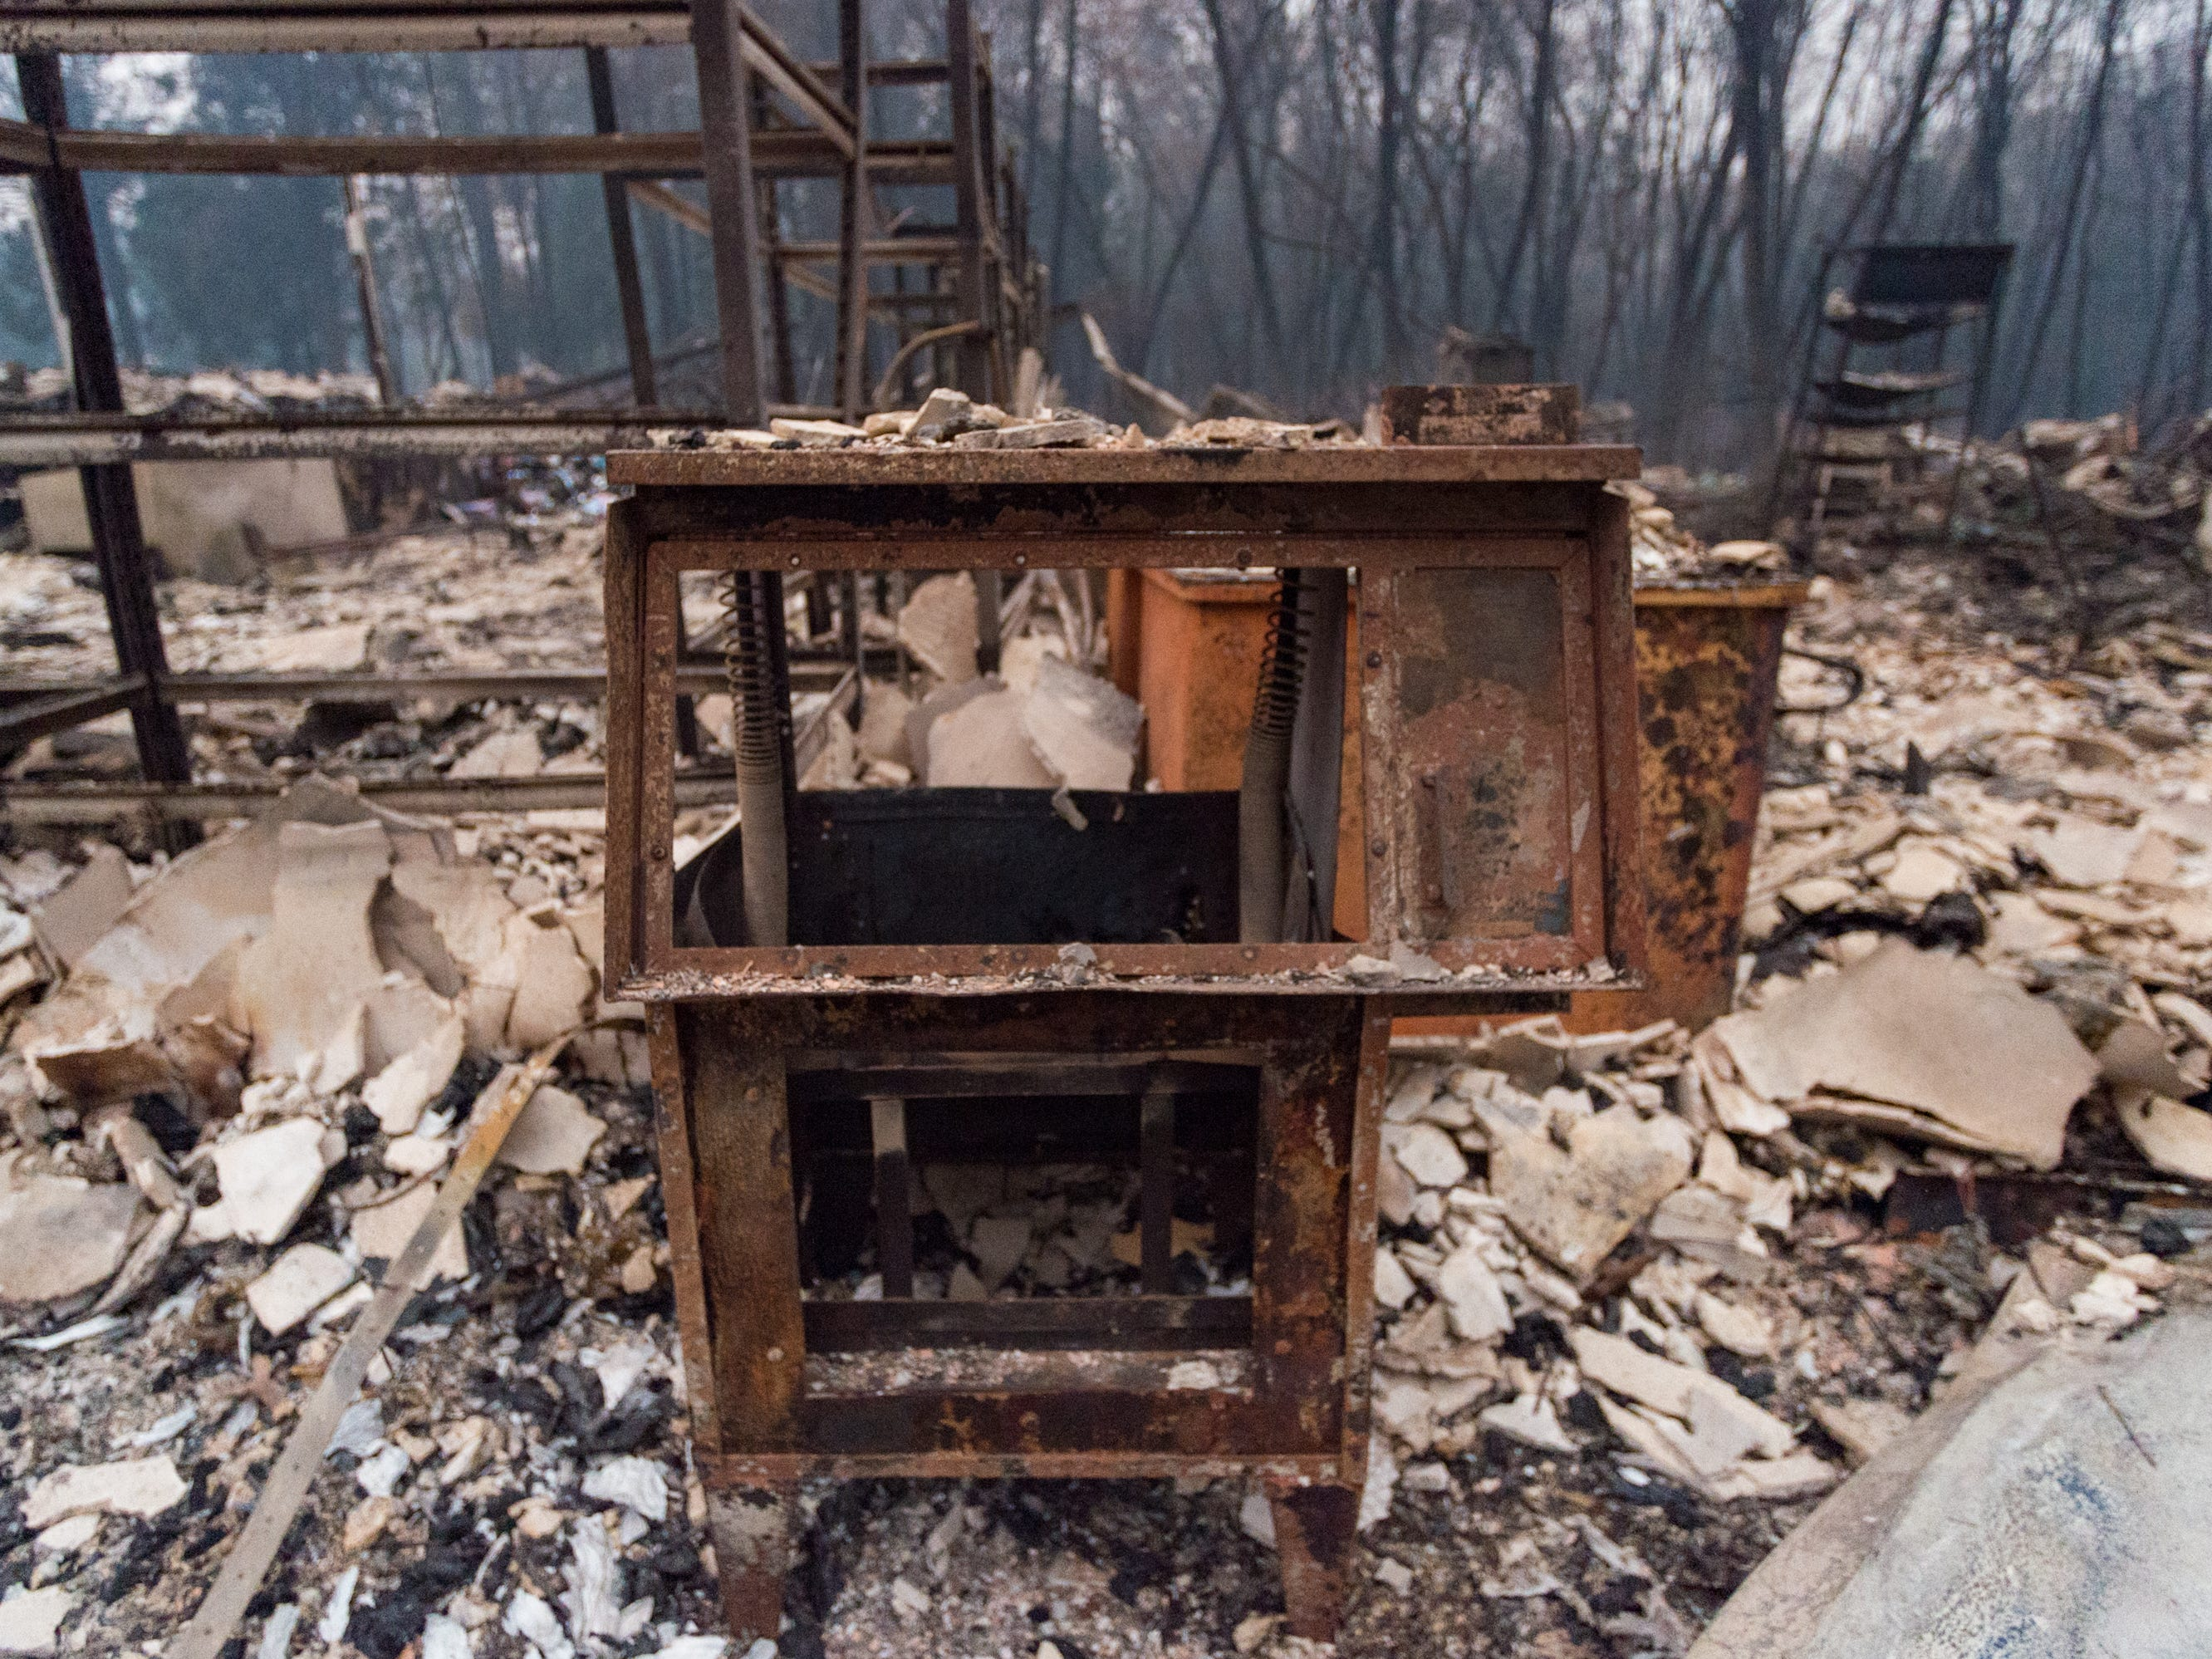 Destruction caused by the Camp Fire near Magalia, Calif., Tuesday, Nov. 13, 2018.